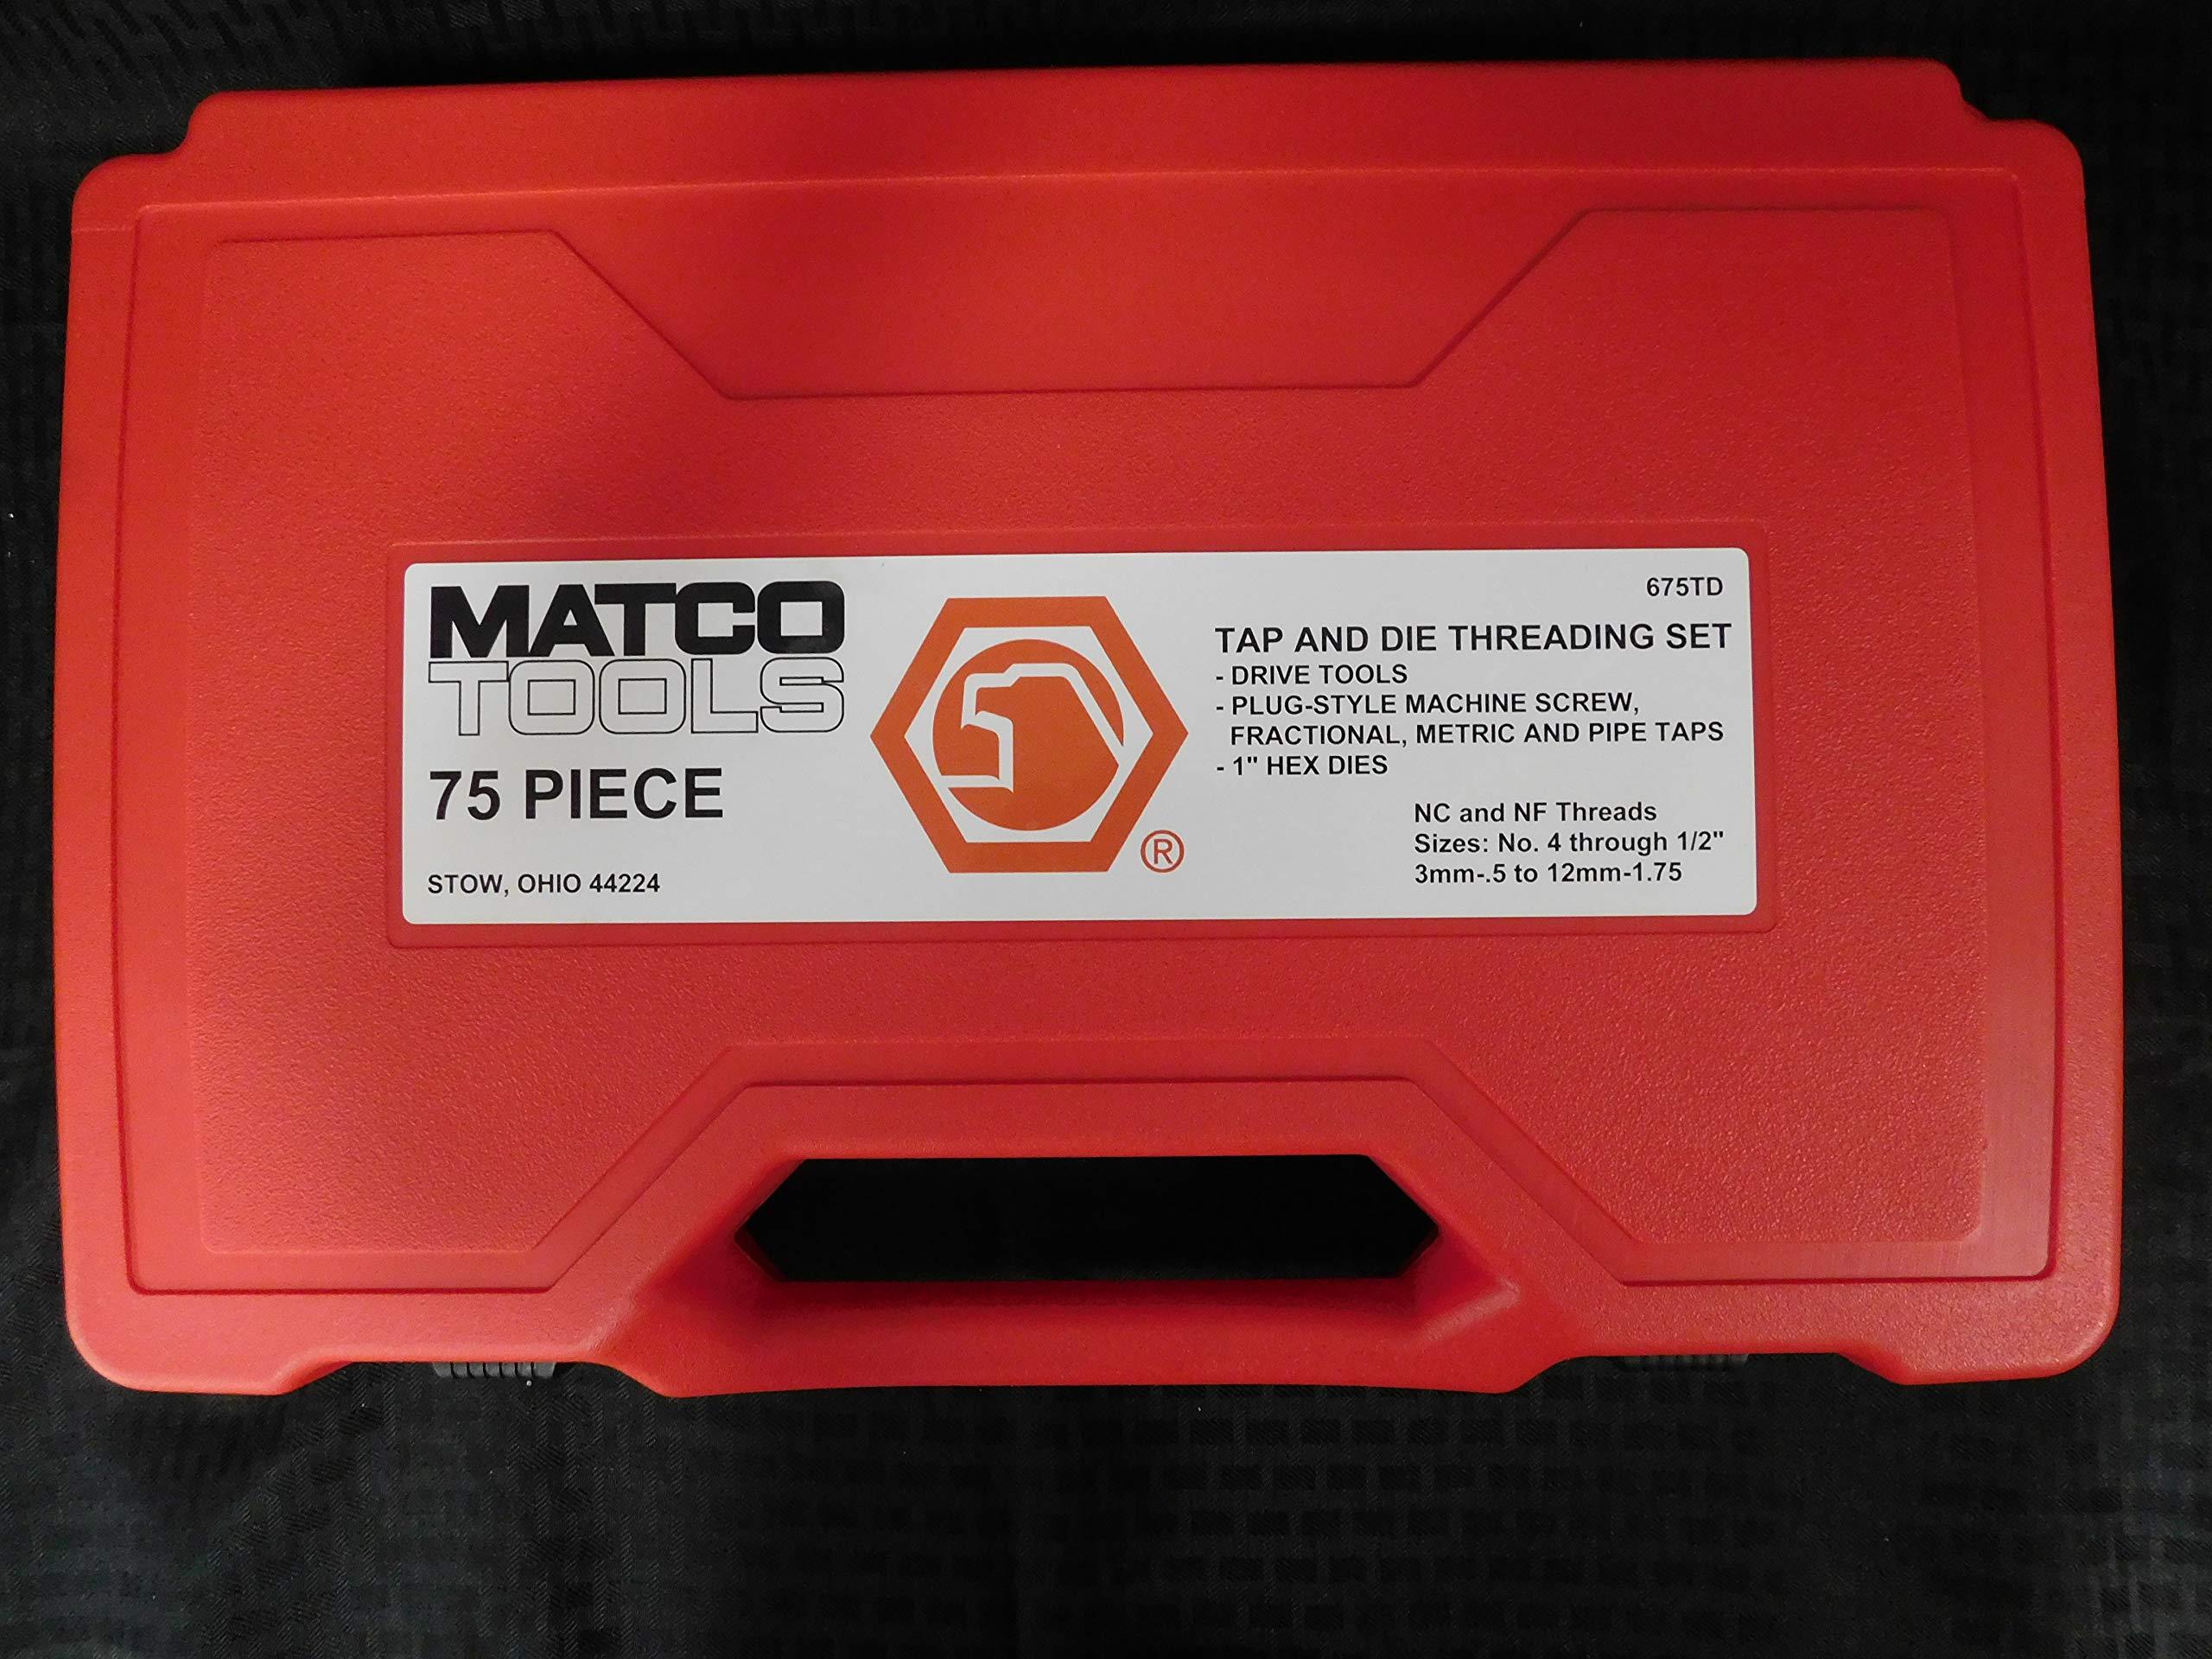 Matco Tools 75 Piece Tap & Die Threading Set, Part #675TD